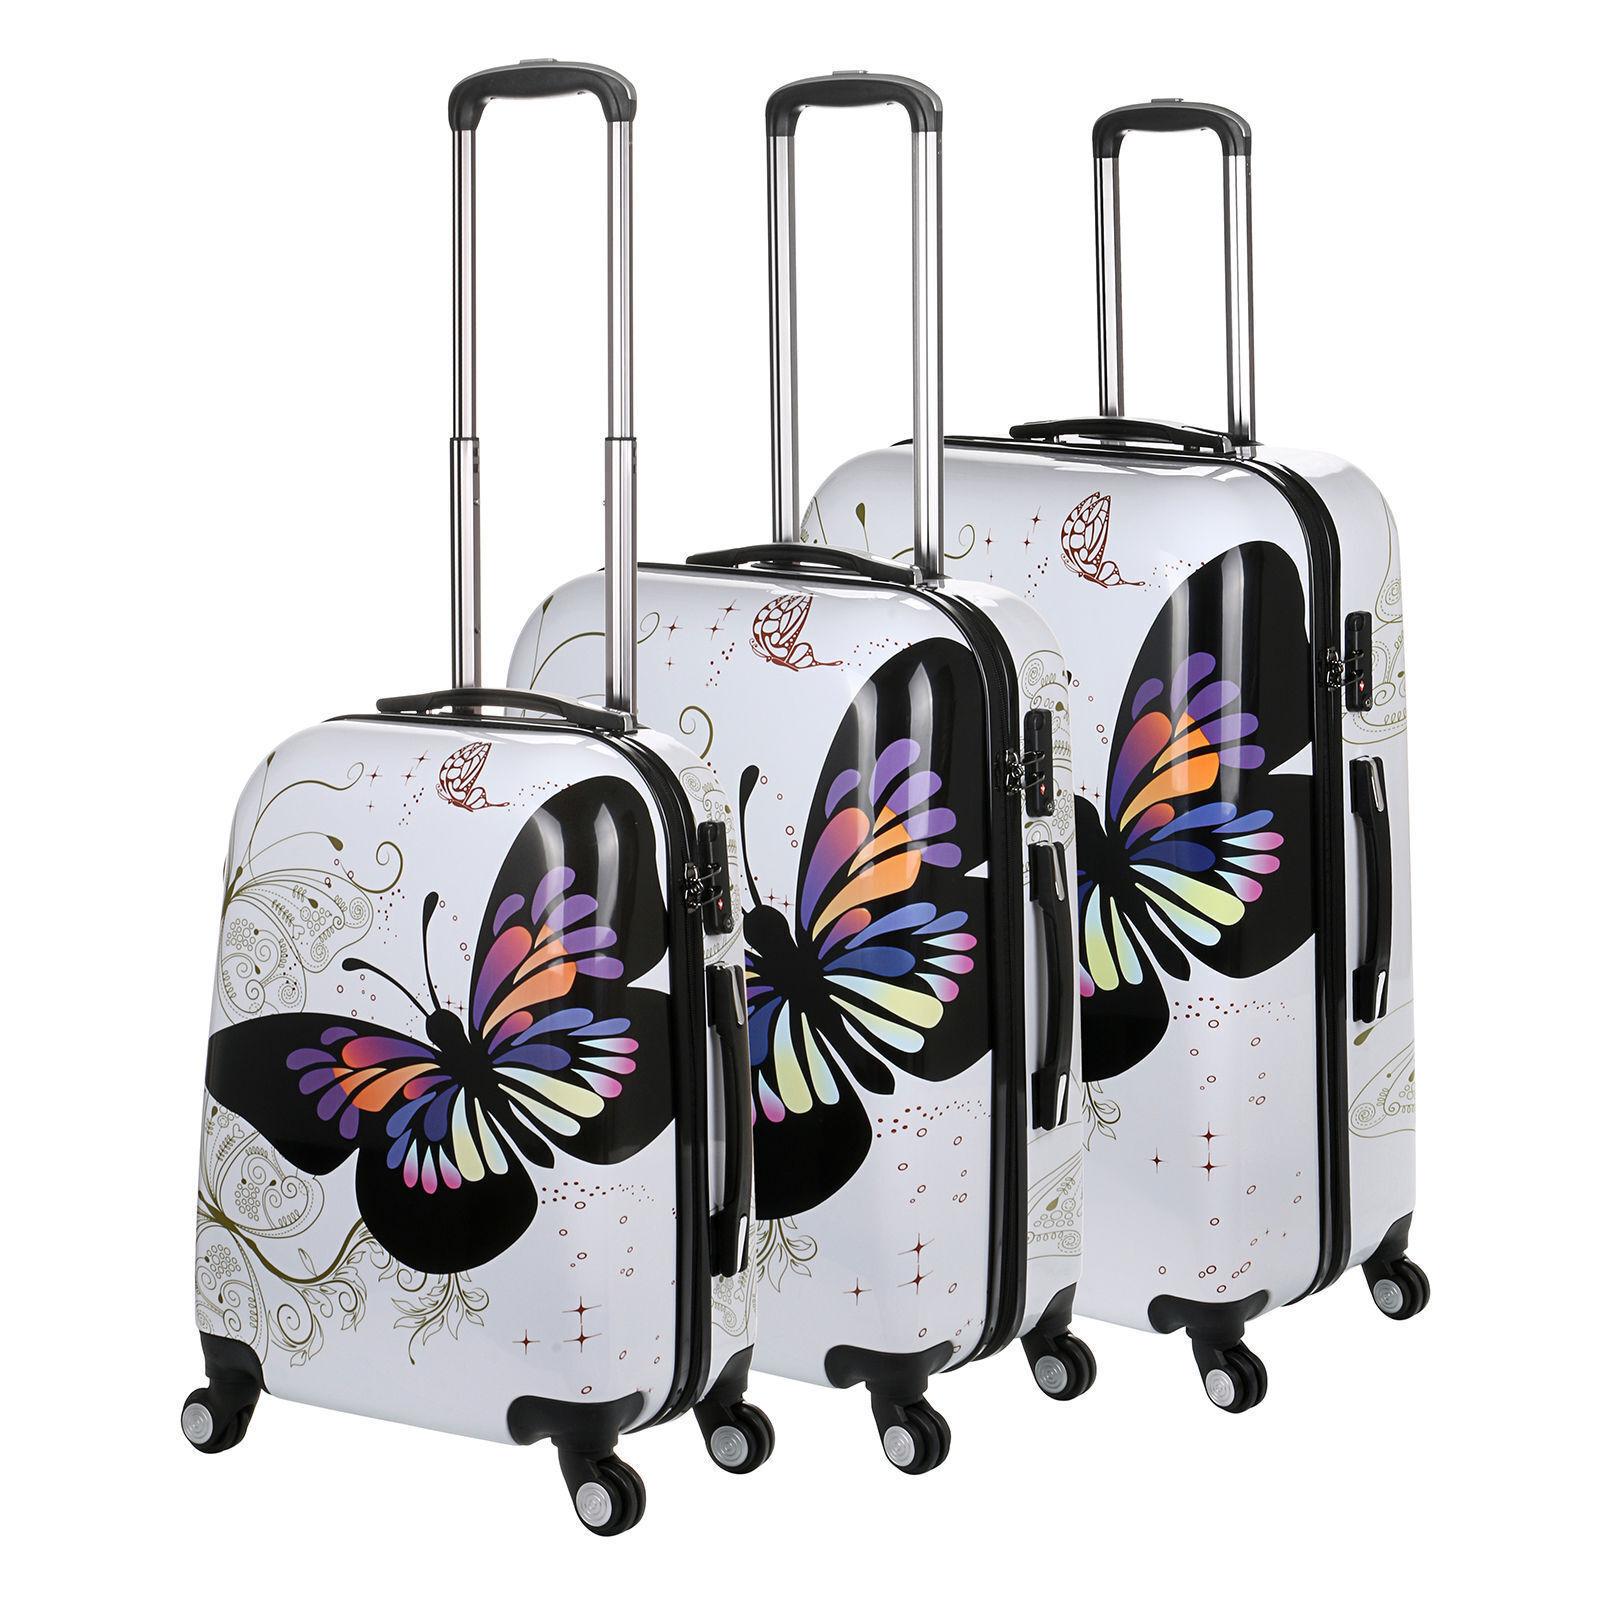 4 roues spinner Rigide Papillon Valise PC Chariot Bagage Cabine Cabine Bagage Étui Sacs da2cf0